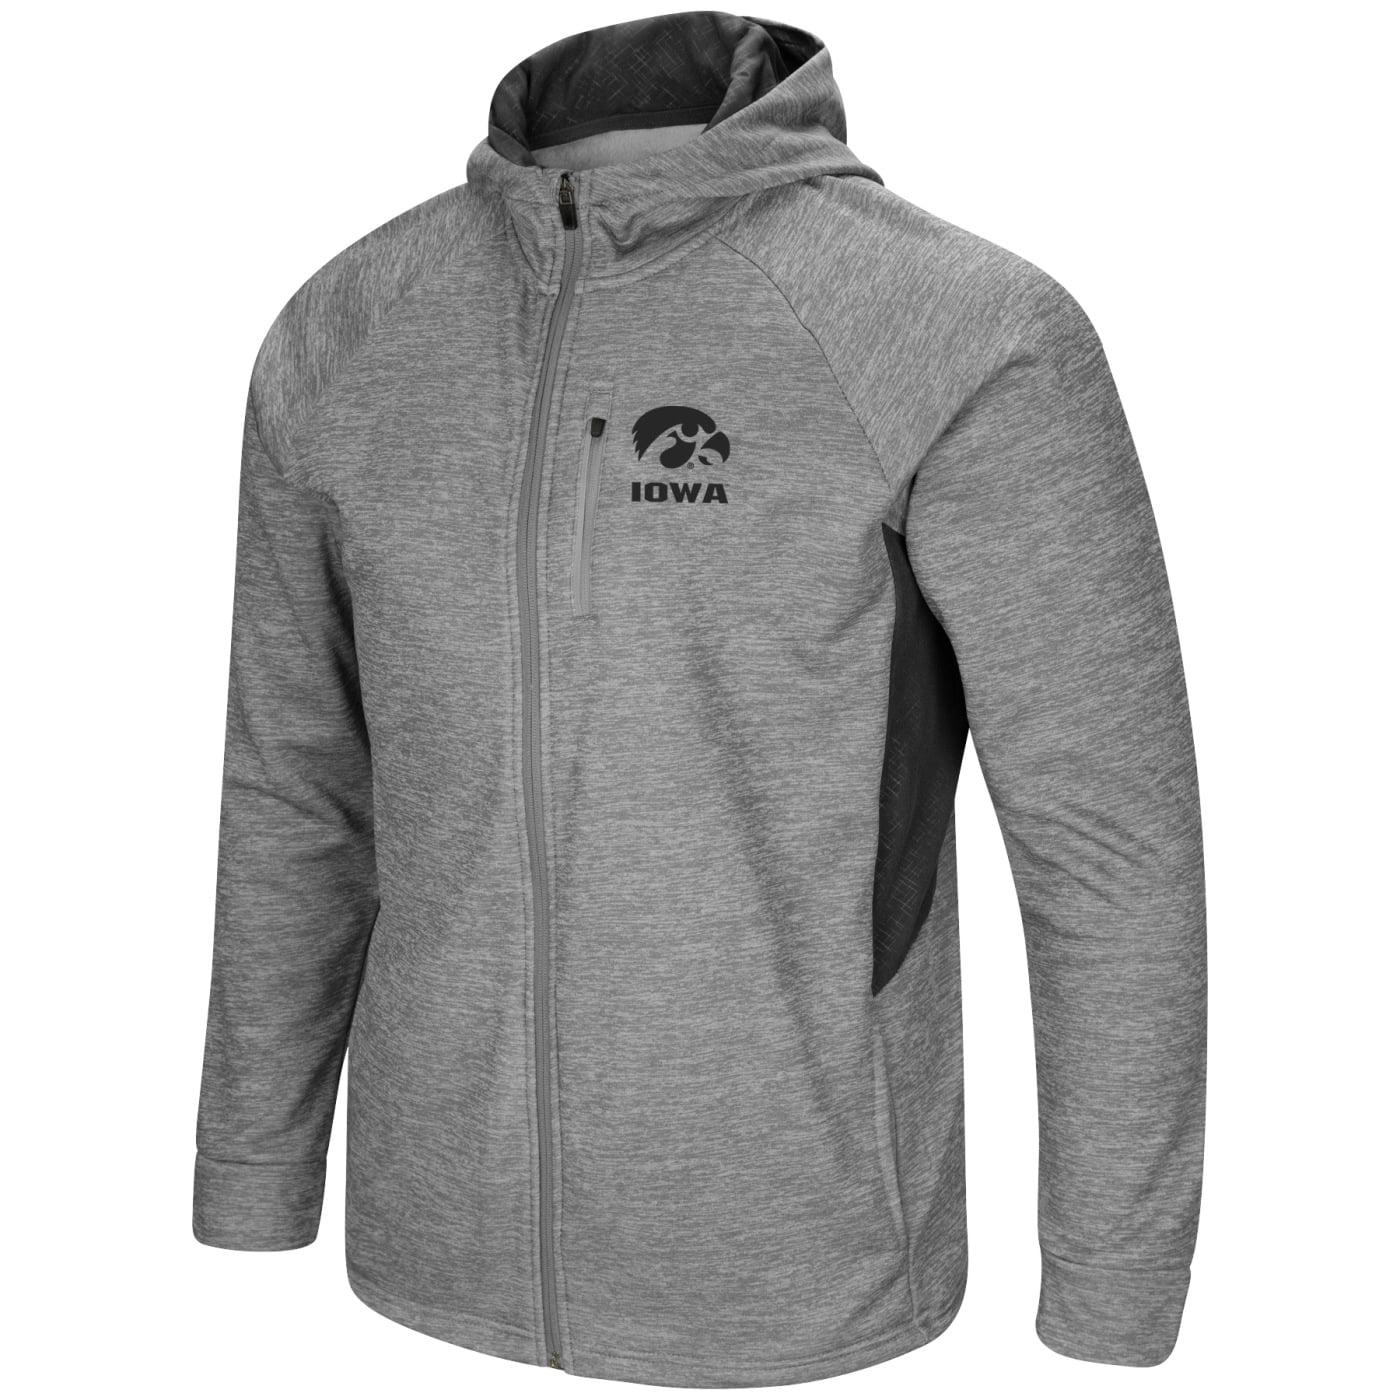 "Iowa Hawkeyes NCAA ""Swing Pass"" Men's Full Zip Hooded Jacket"